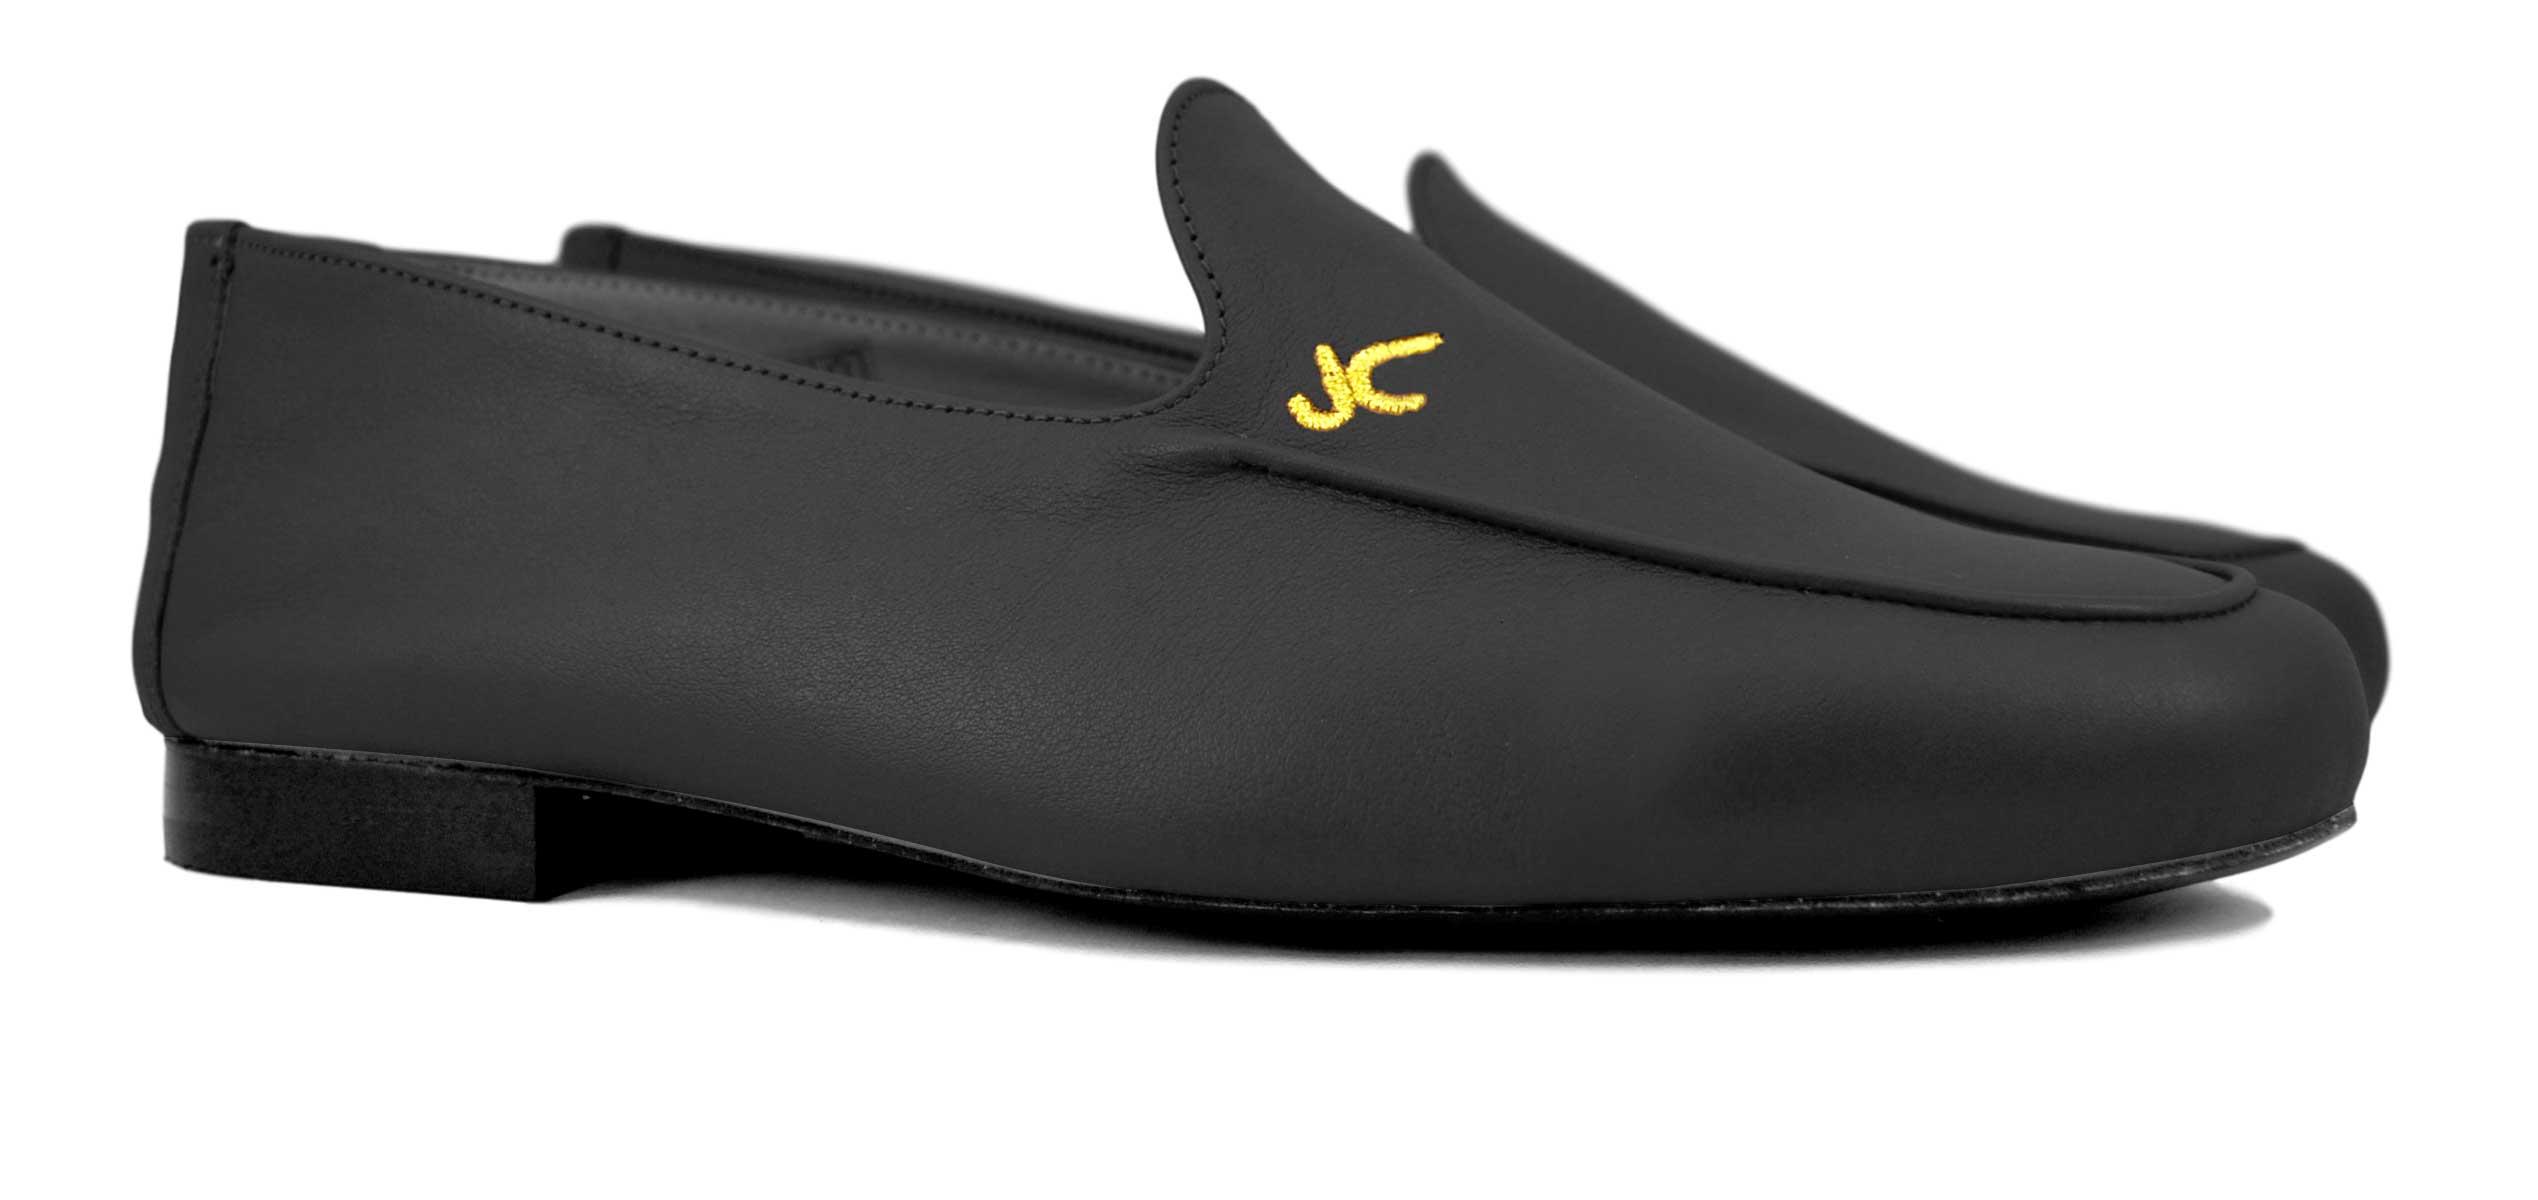 Foto 5 de Zapatos Julio Iglesias 528 JC Graphite Piel Napa